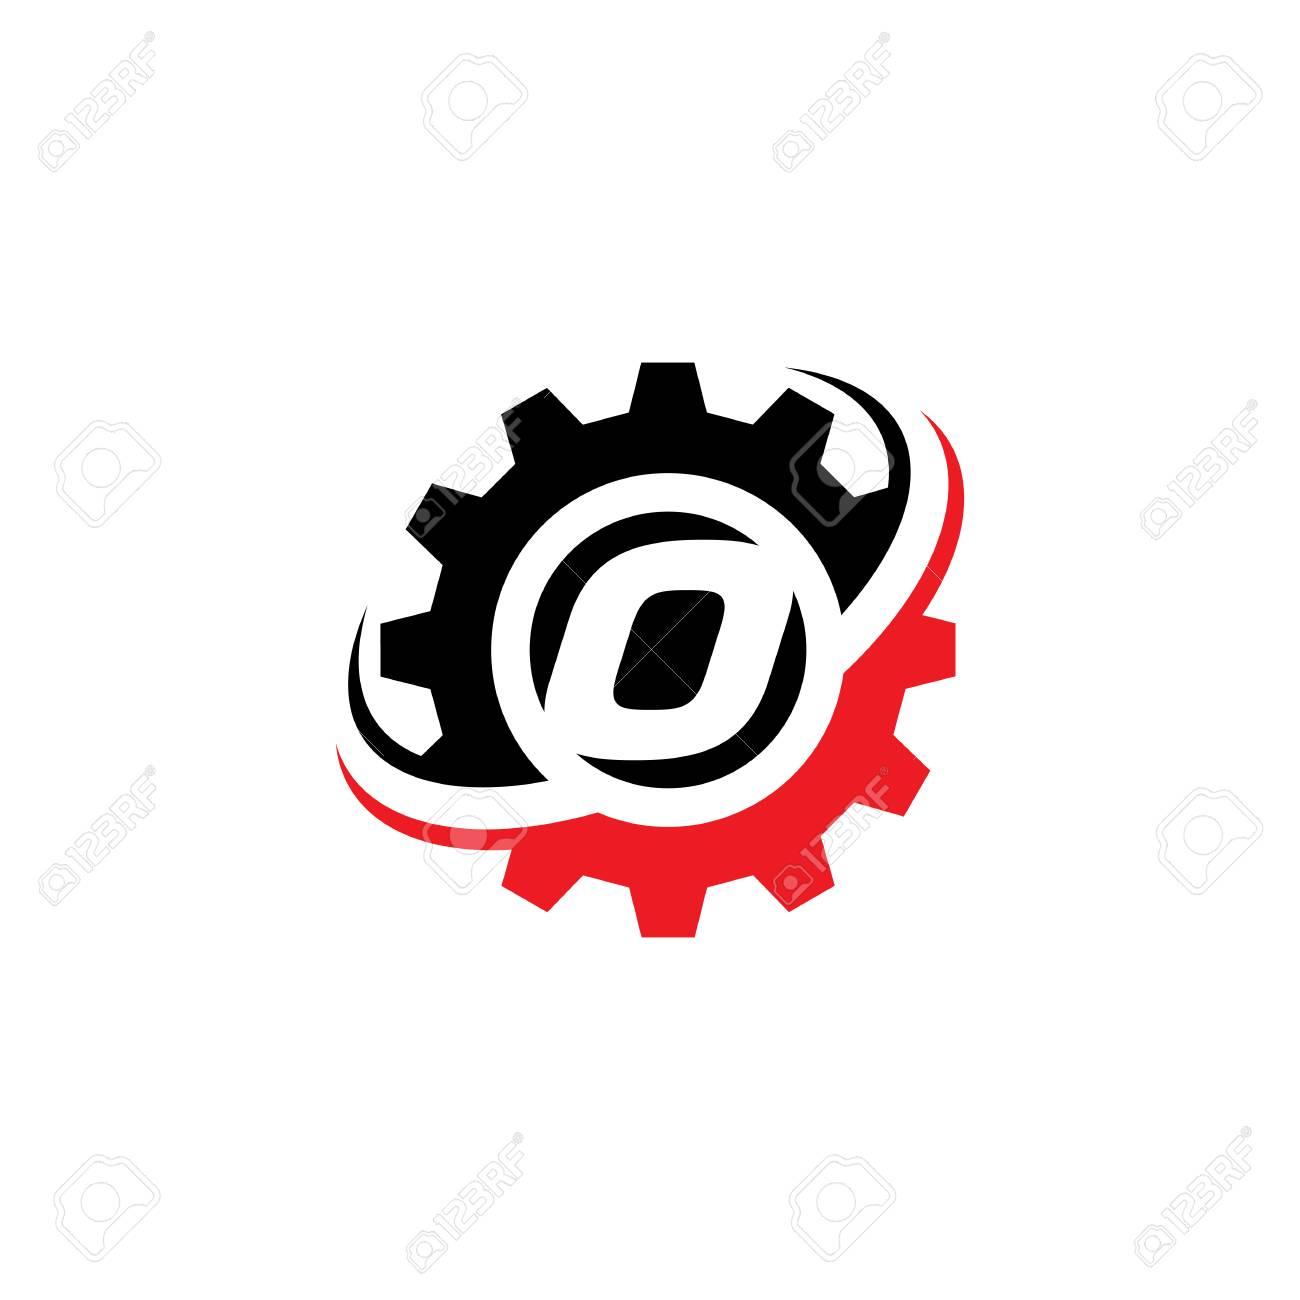 Letter O Gear Logo Design Template - 105107430